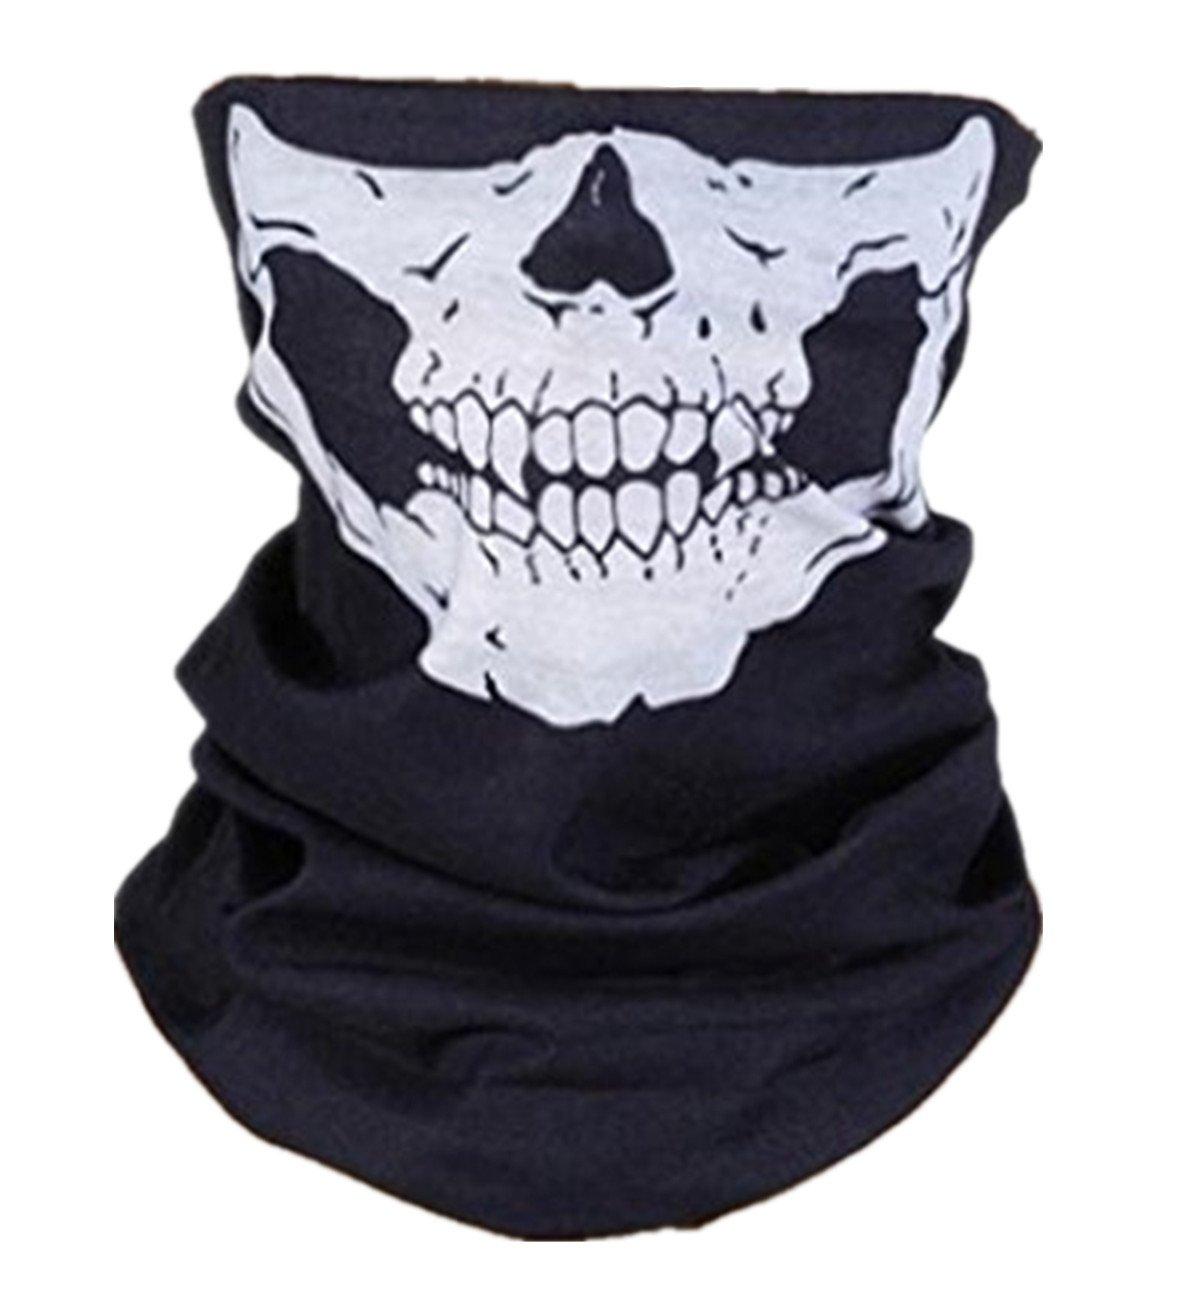 Sanlise 2014 NEU Sport Masken Skelett Gesichtsmaske Kopftuch Stirnband Fahrrad Motorrad Ski Kopfhaube Balaclava Schlitz schwarz Skull Totenkopf Maske Totenkopf Skull Face 2 (01) KT-SUPPLY WFM90